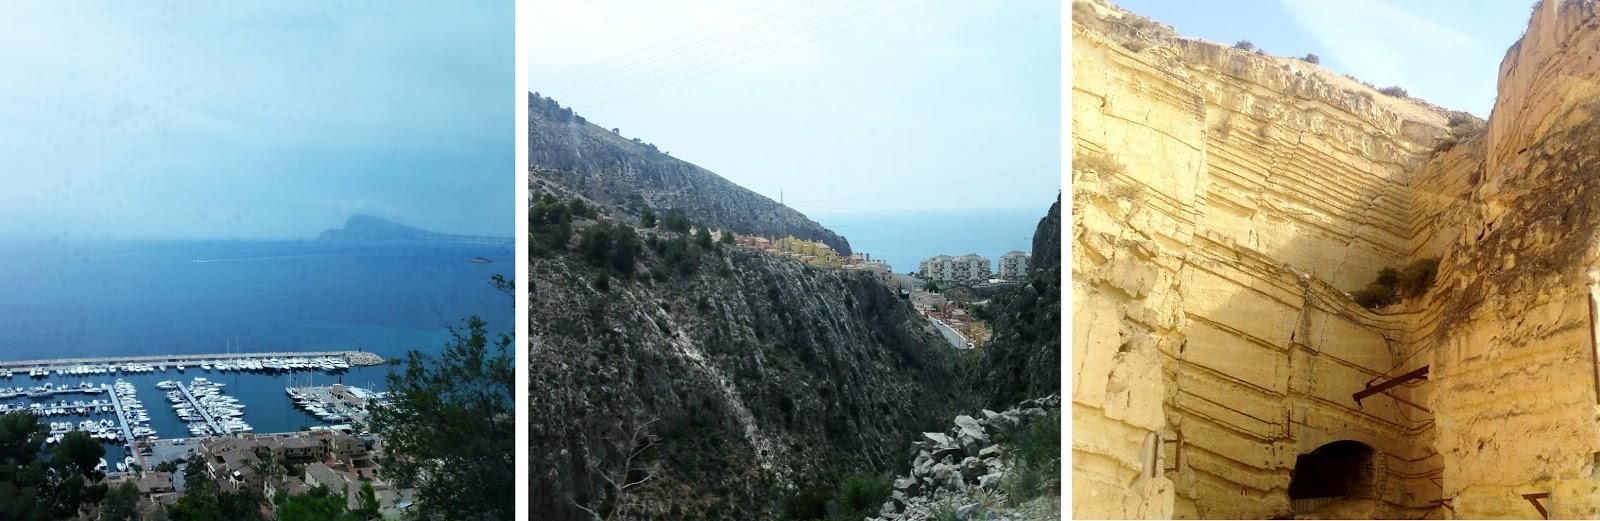 jak dojechać do Calpe z Alicante